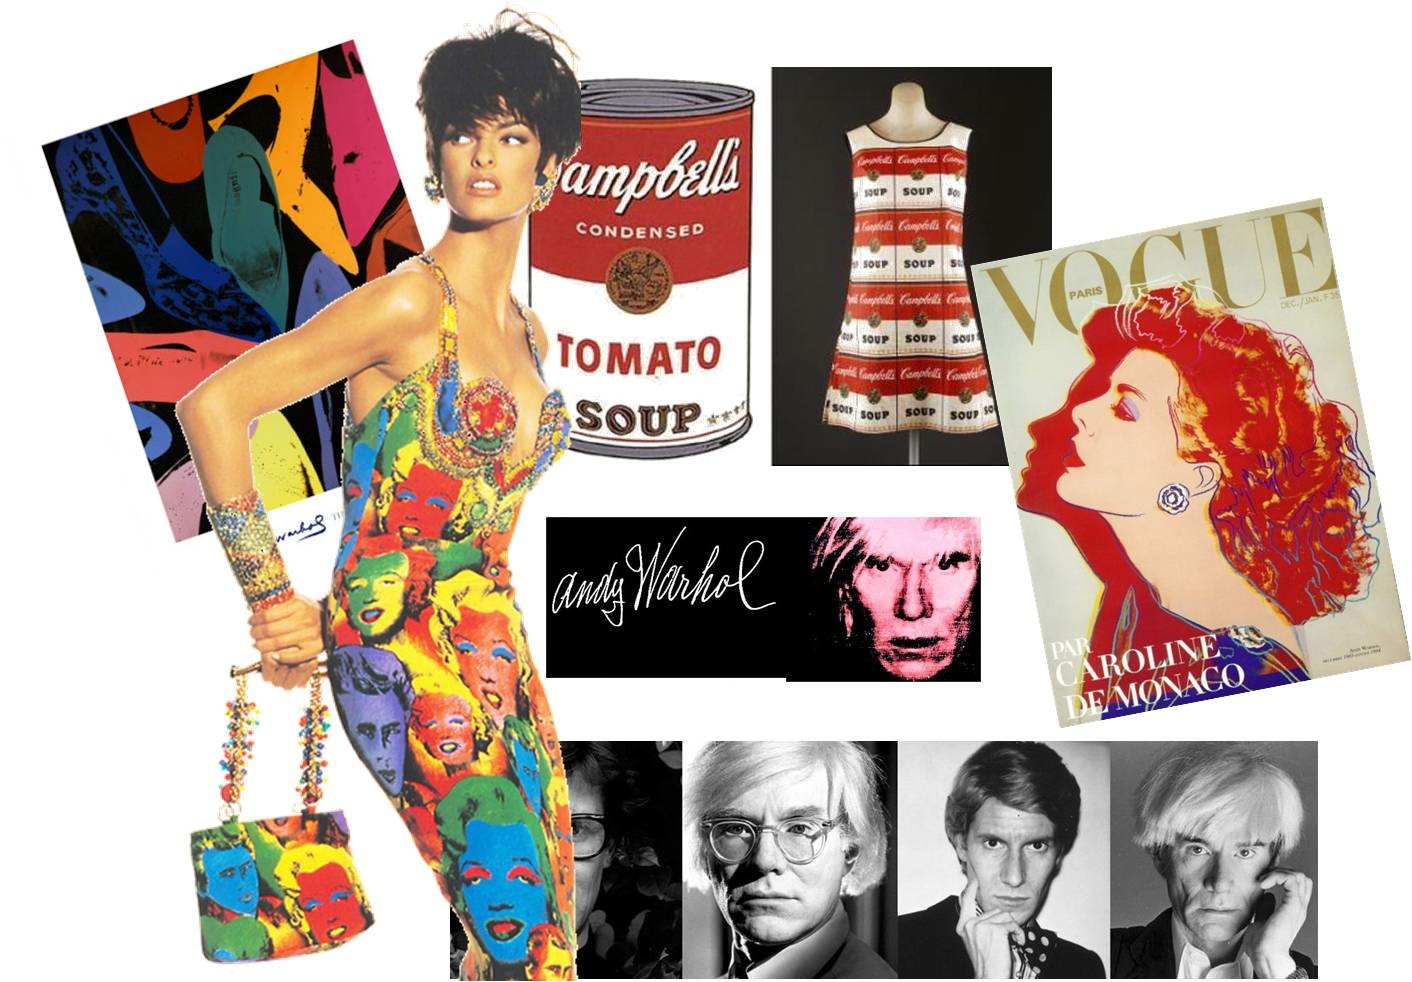 Favoloso Circus in Fashion: POP ART CONTAMINATION KL95